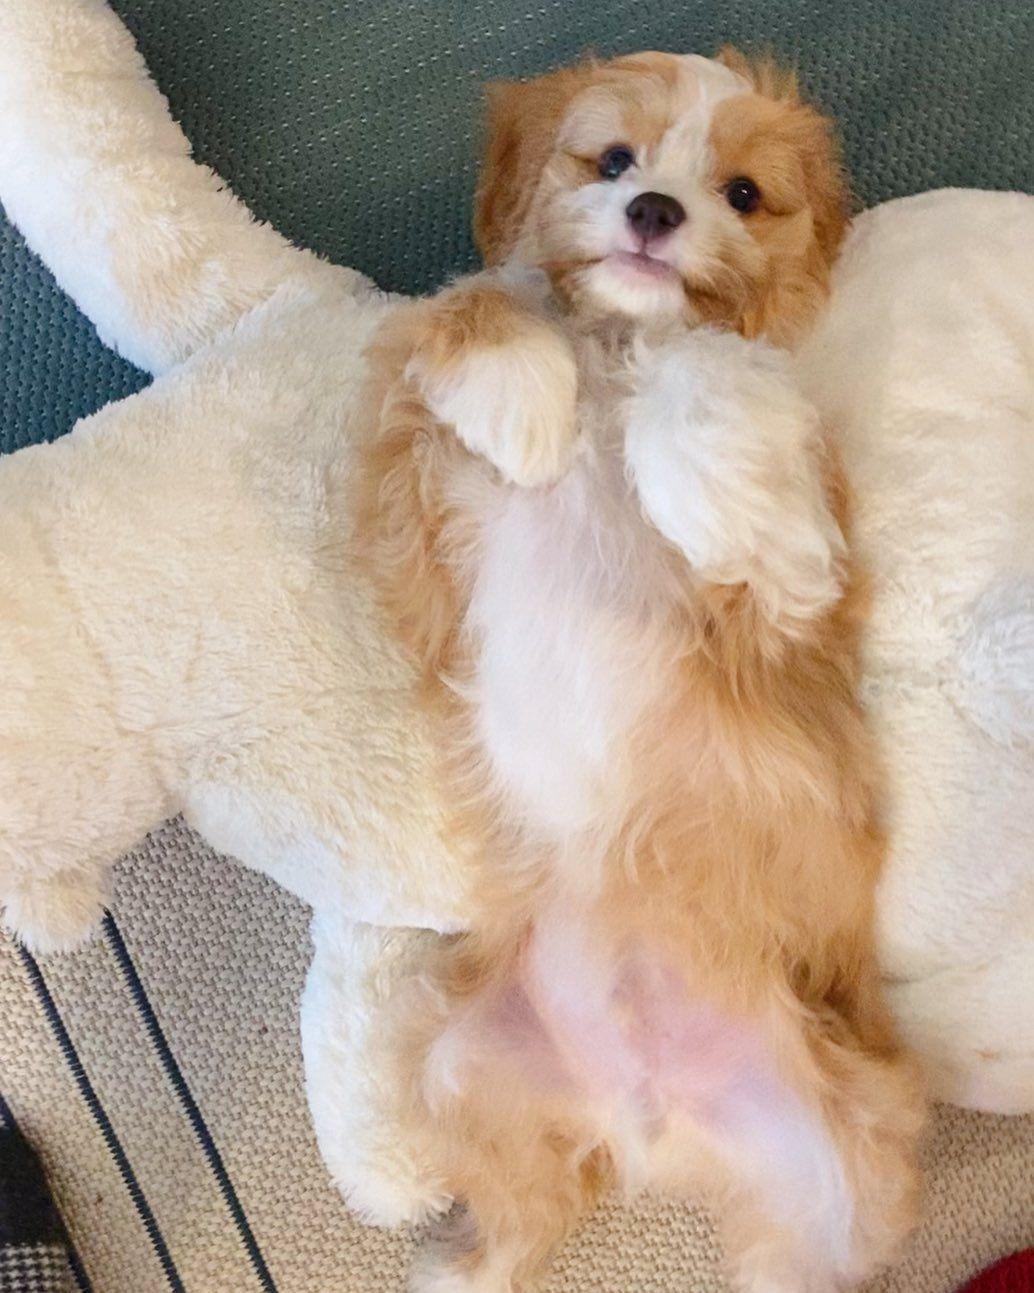 Gimme Gimme All The Belly Rubs Cavapoo Cavapoosofinstagram Cavapooworld Cavapoopuppy Cavapoolove Cavoodle In 2020 Cavapoo Puppies Cavapoo Corgi